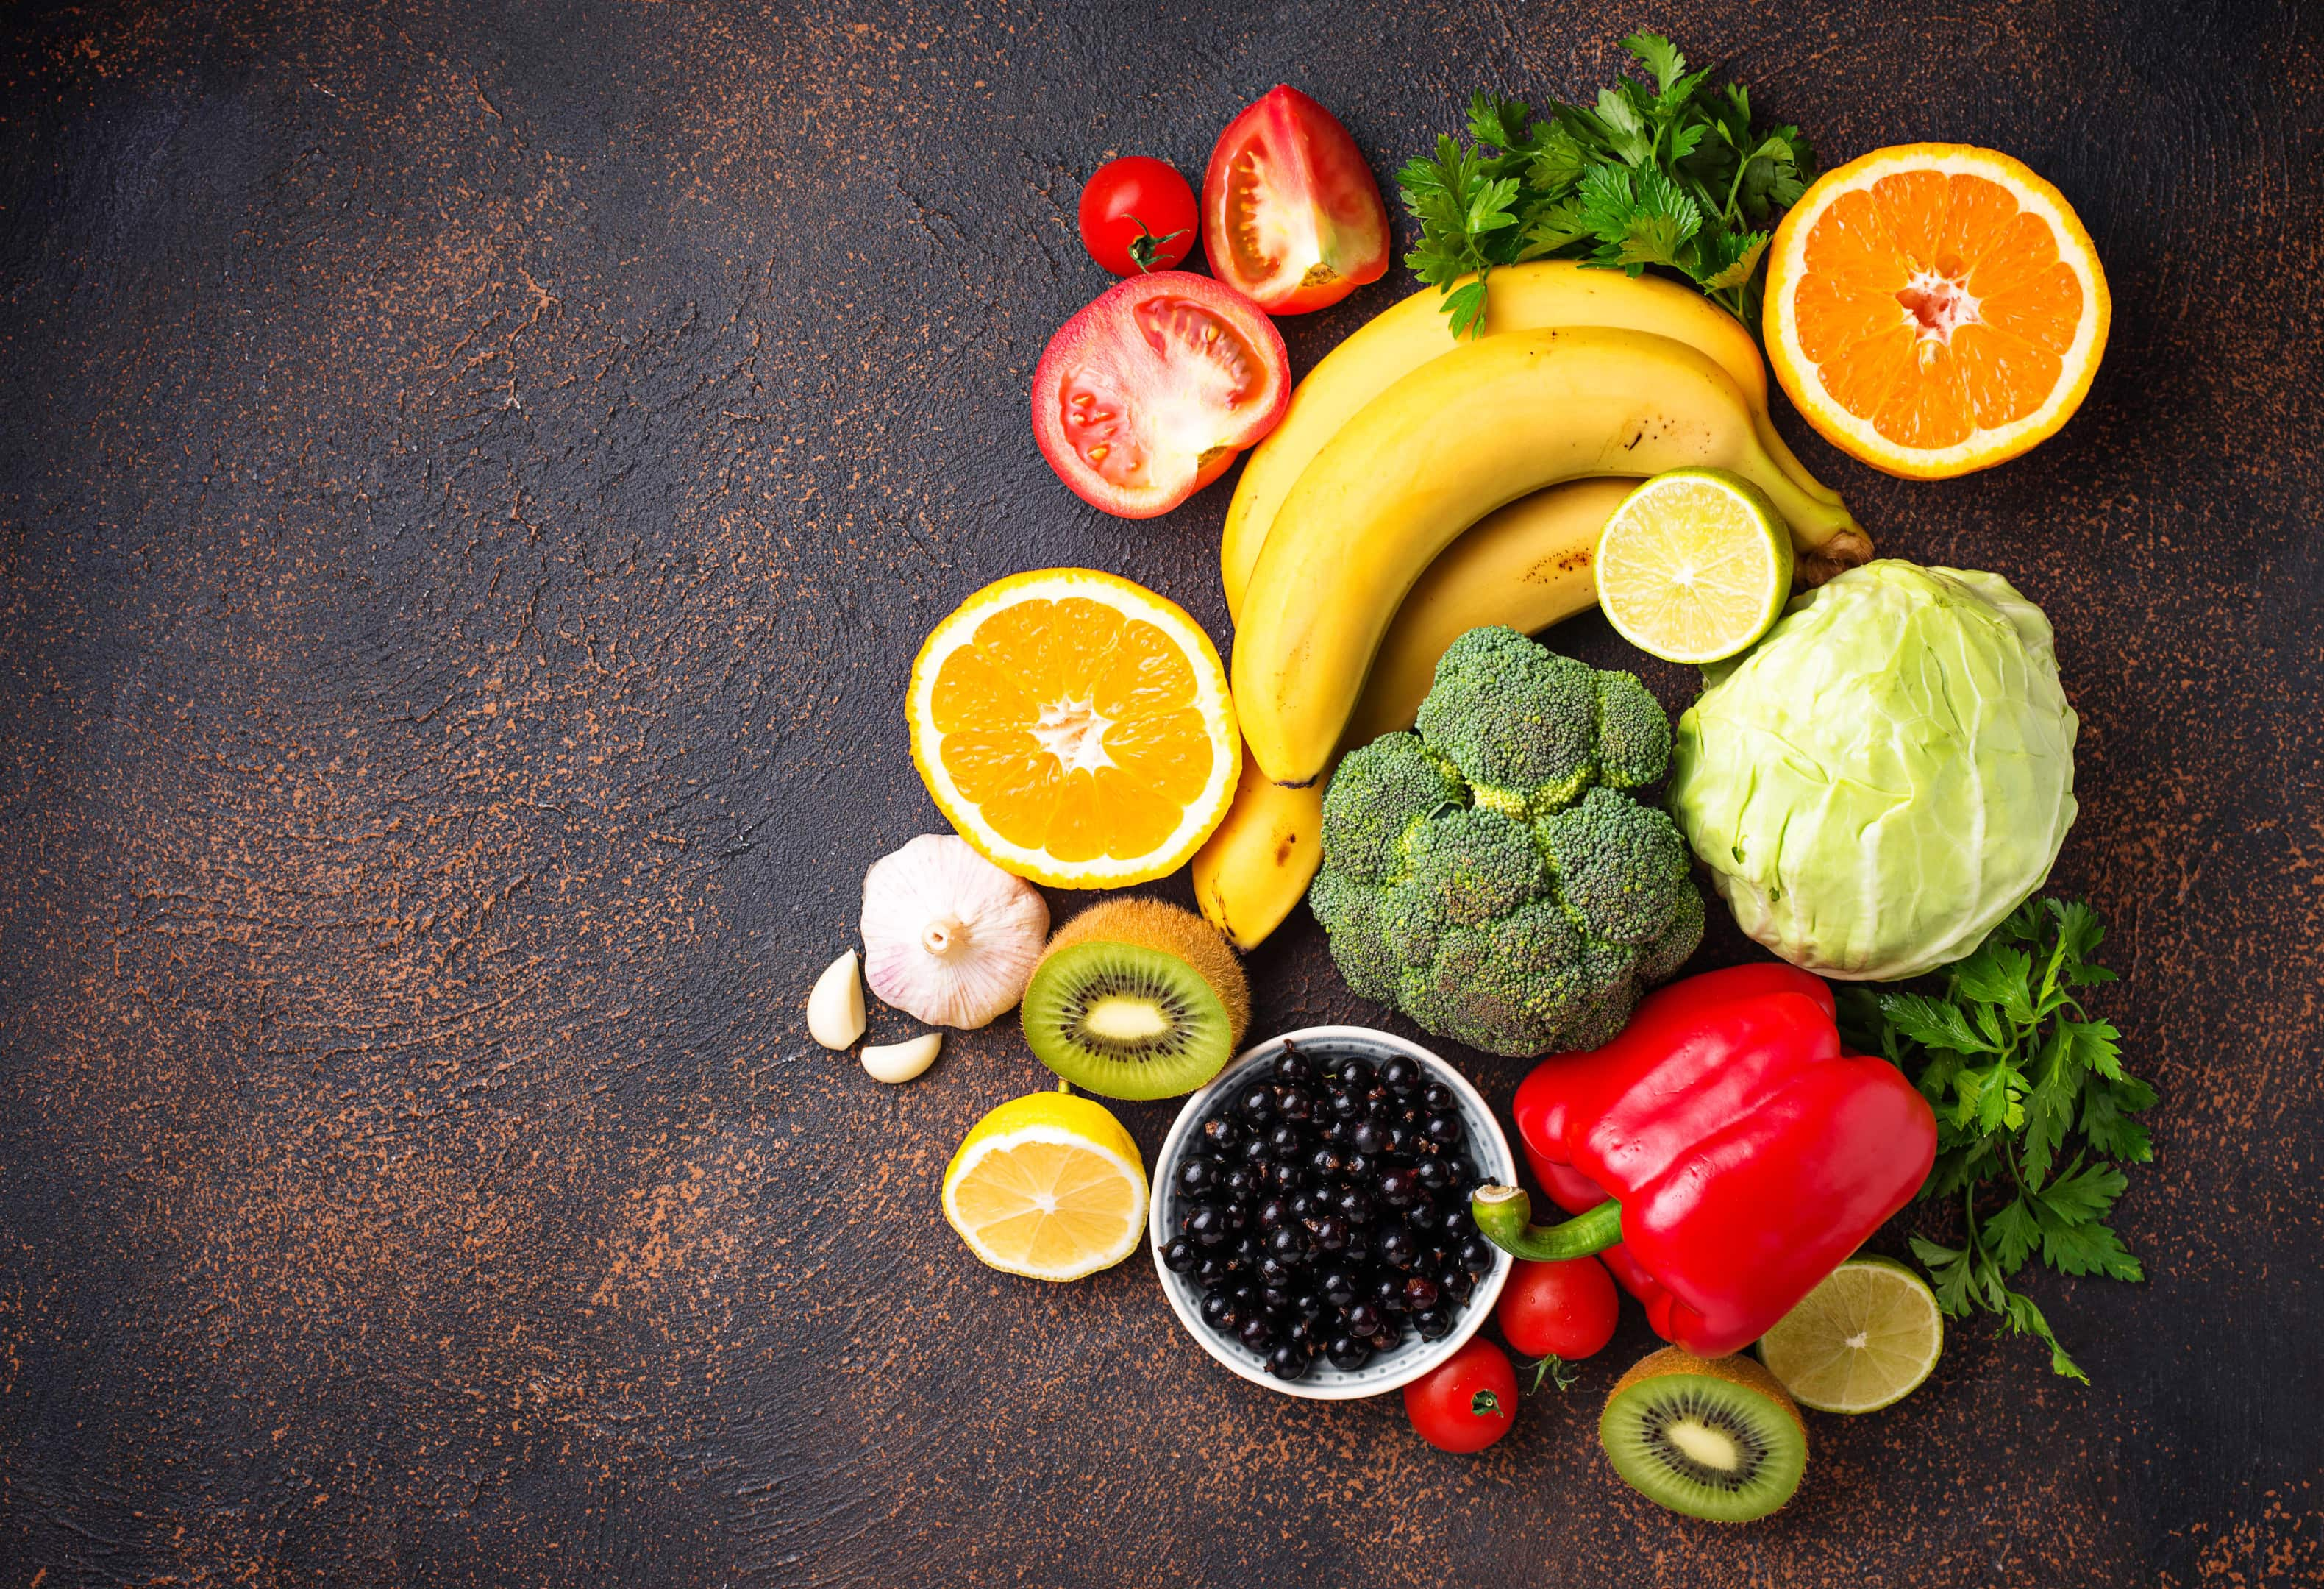 Healthy food containing vitamin C